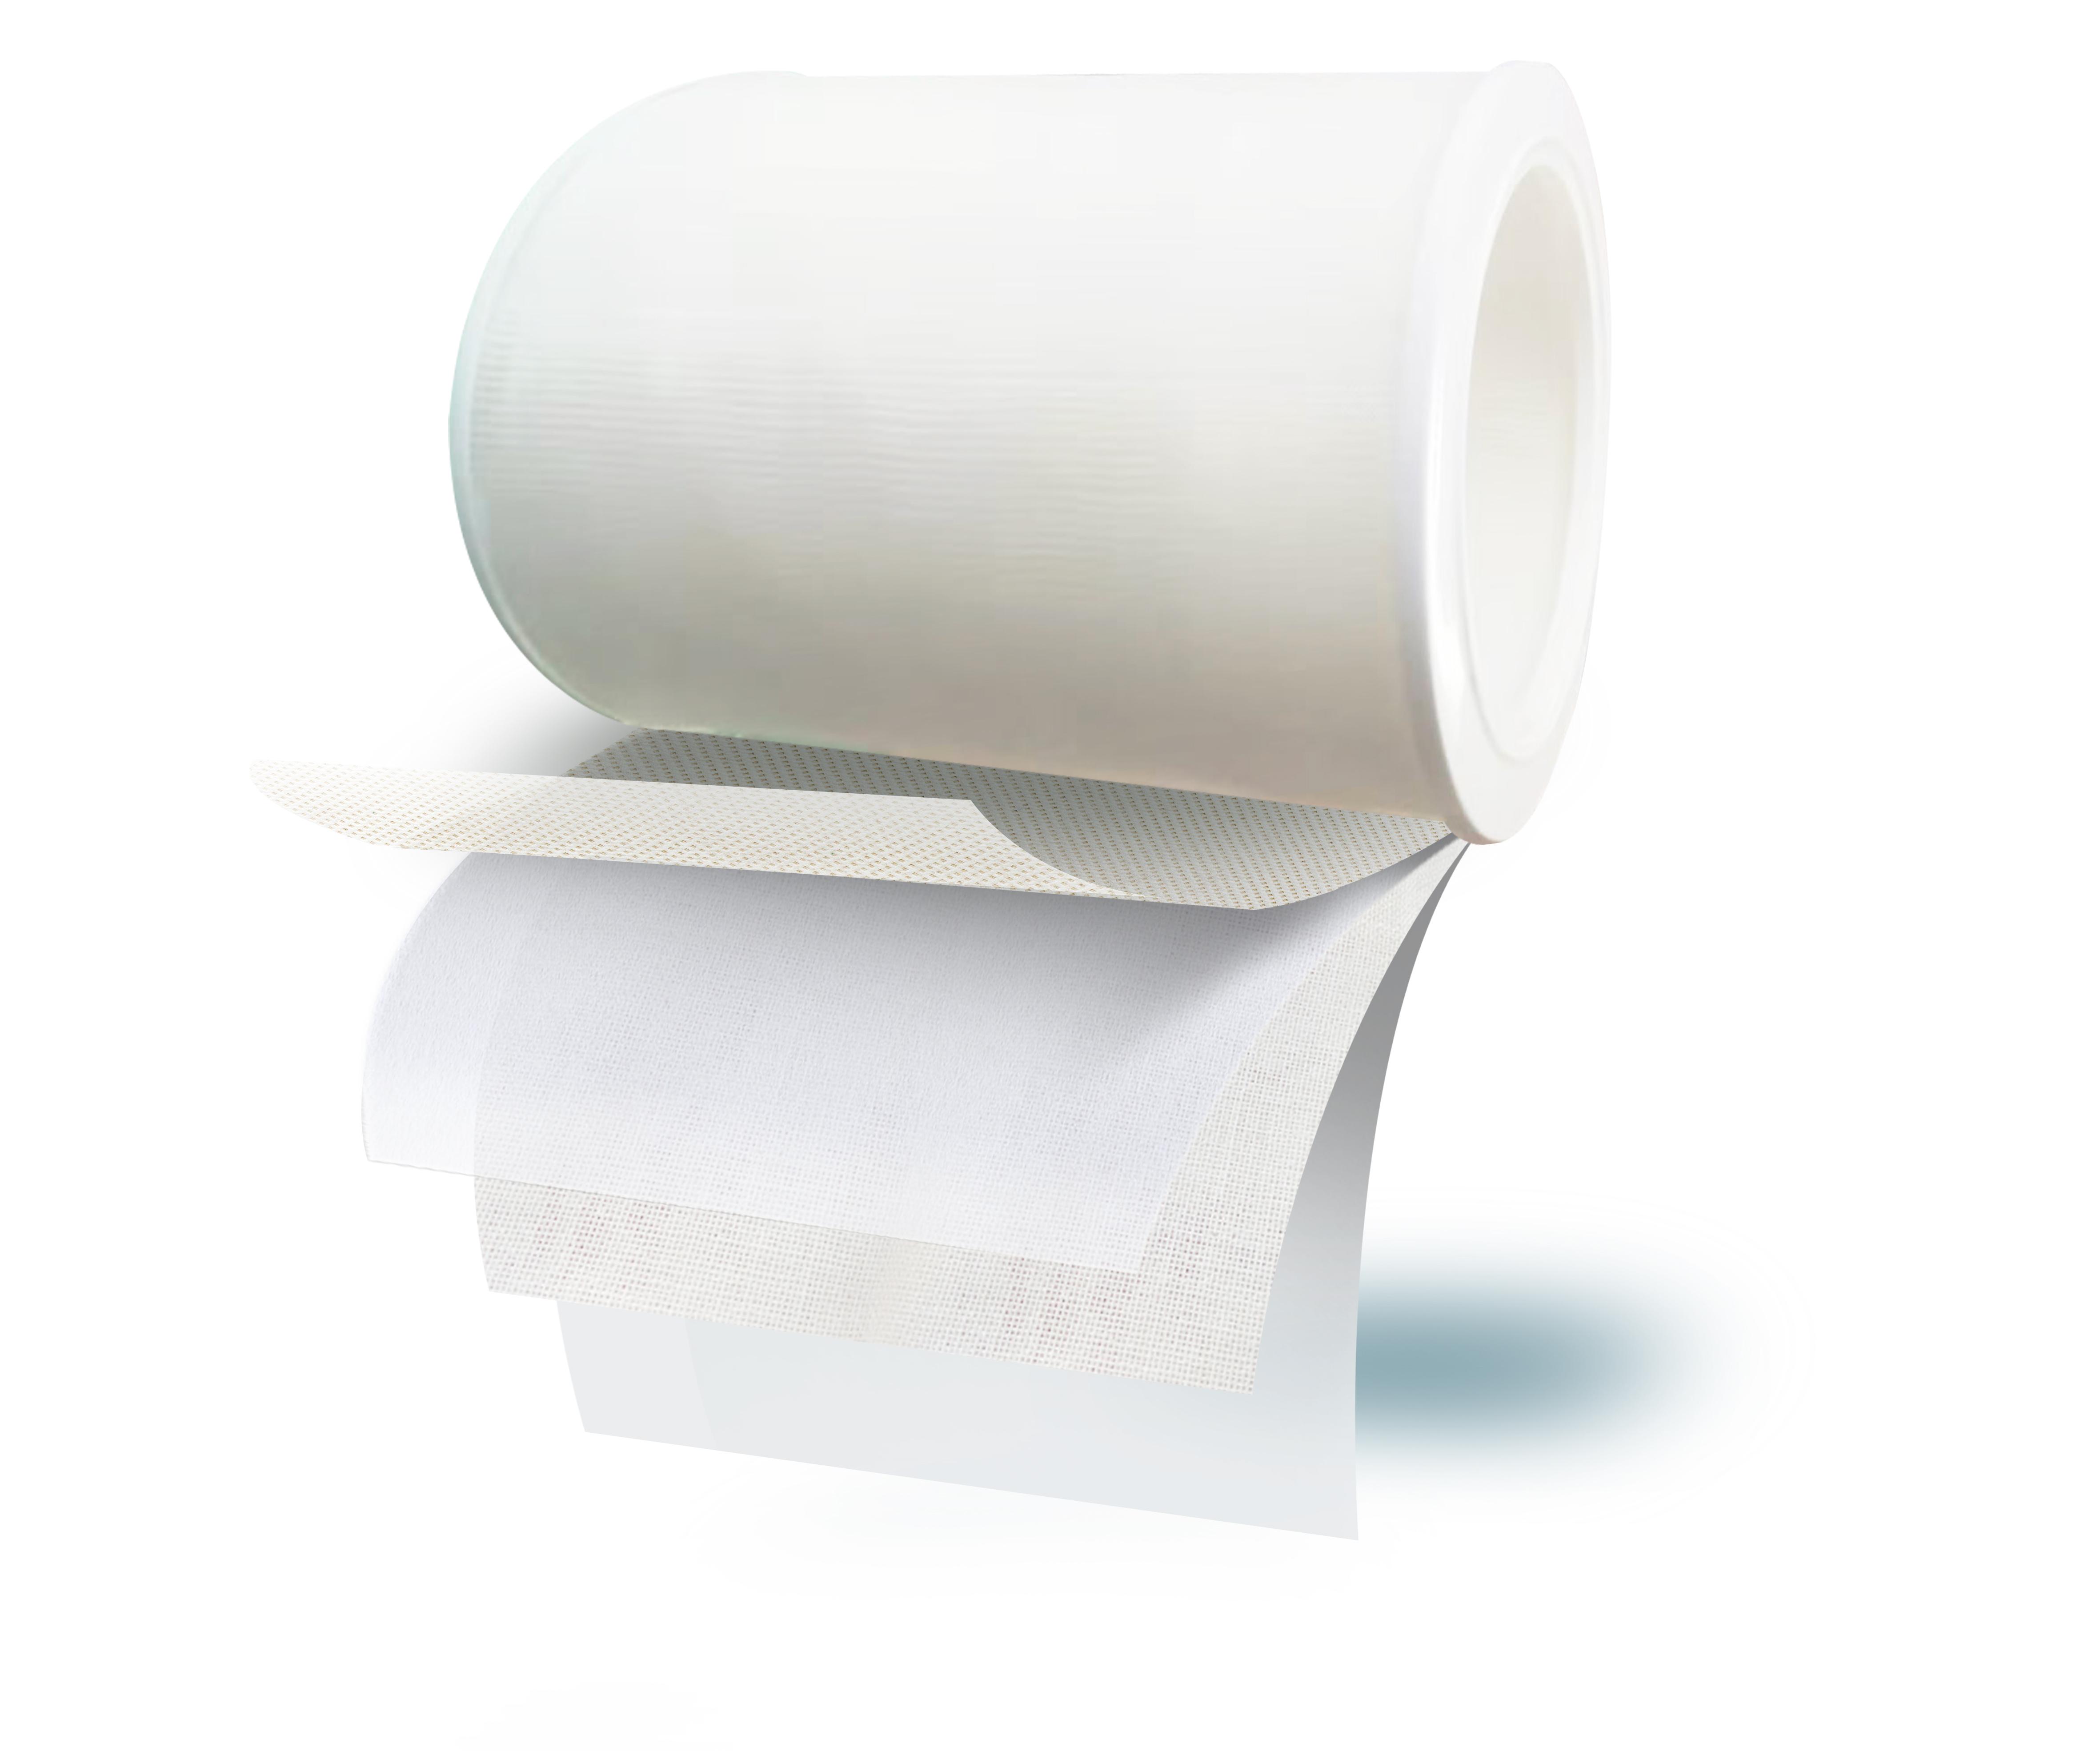 nano fiber membrane filter material